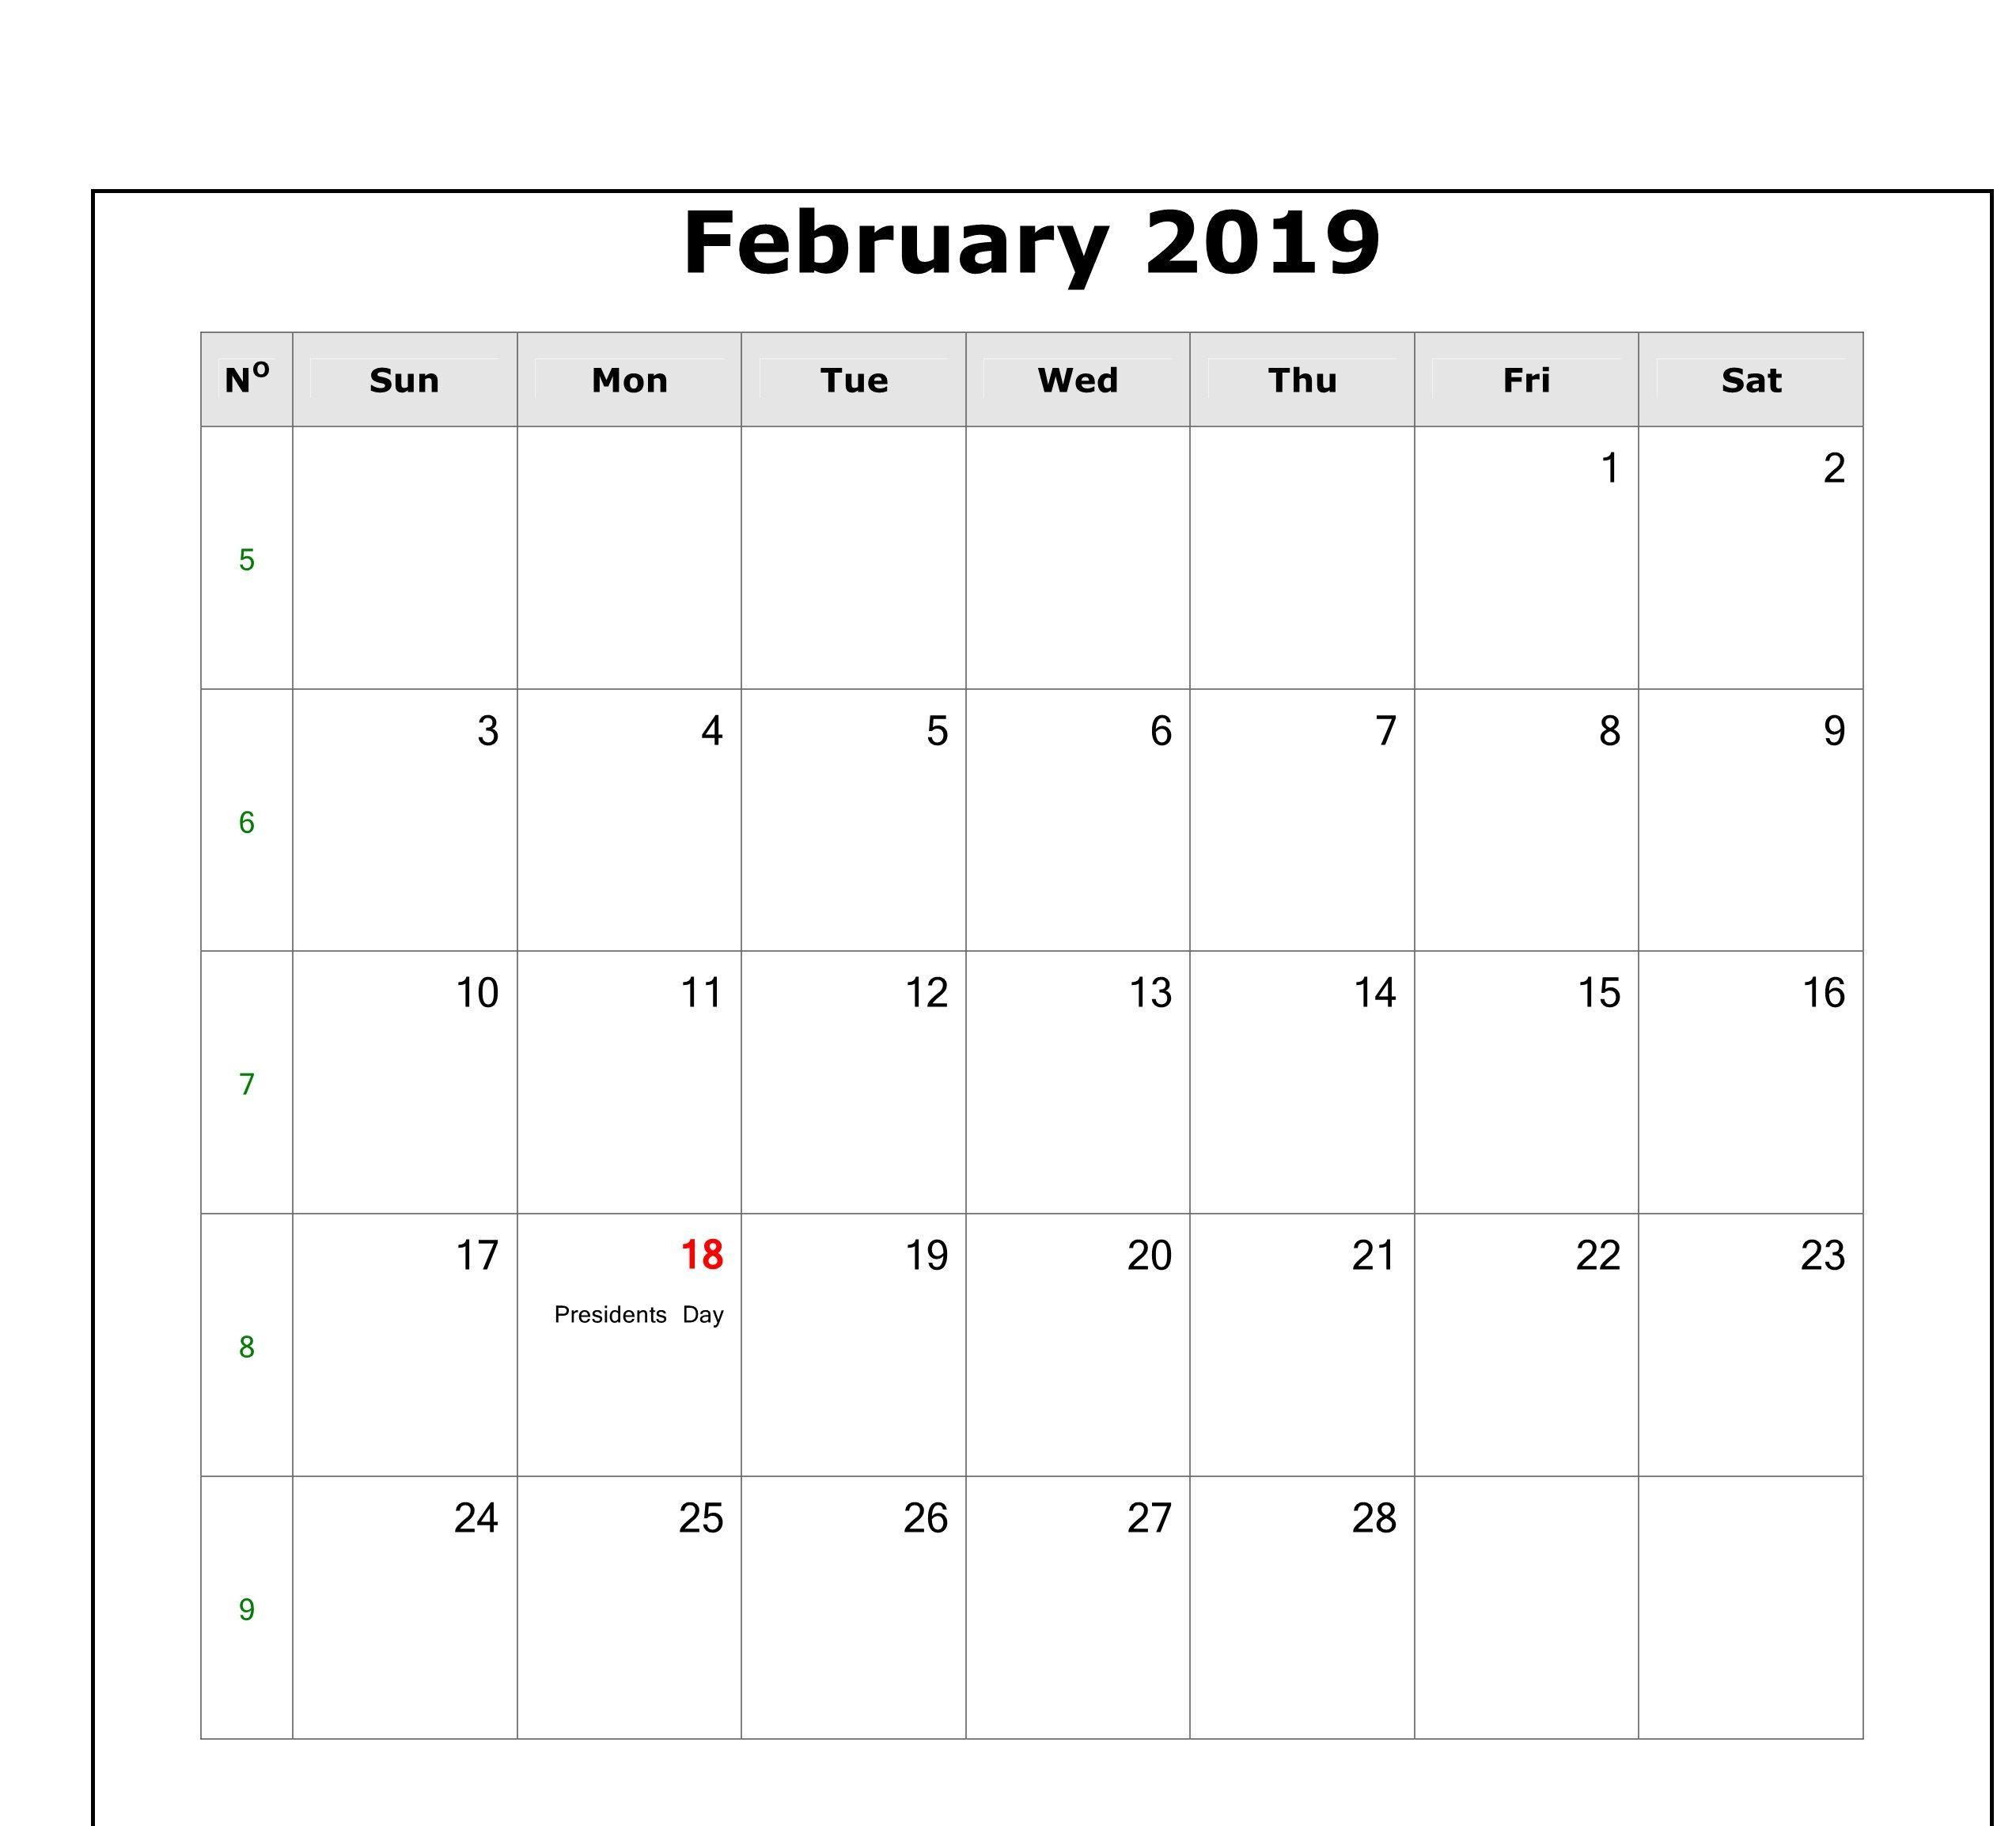 February 2019 Calendar With Holidays Printable February 2019